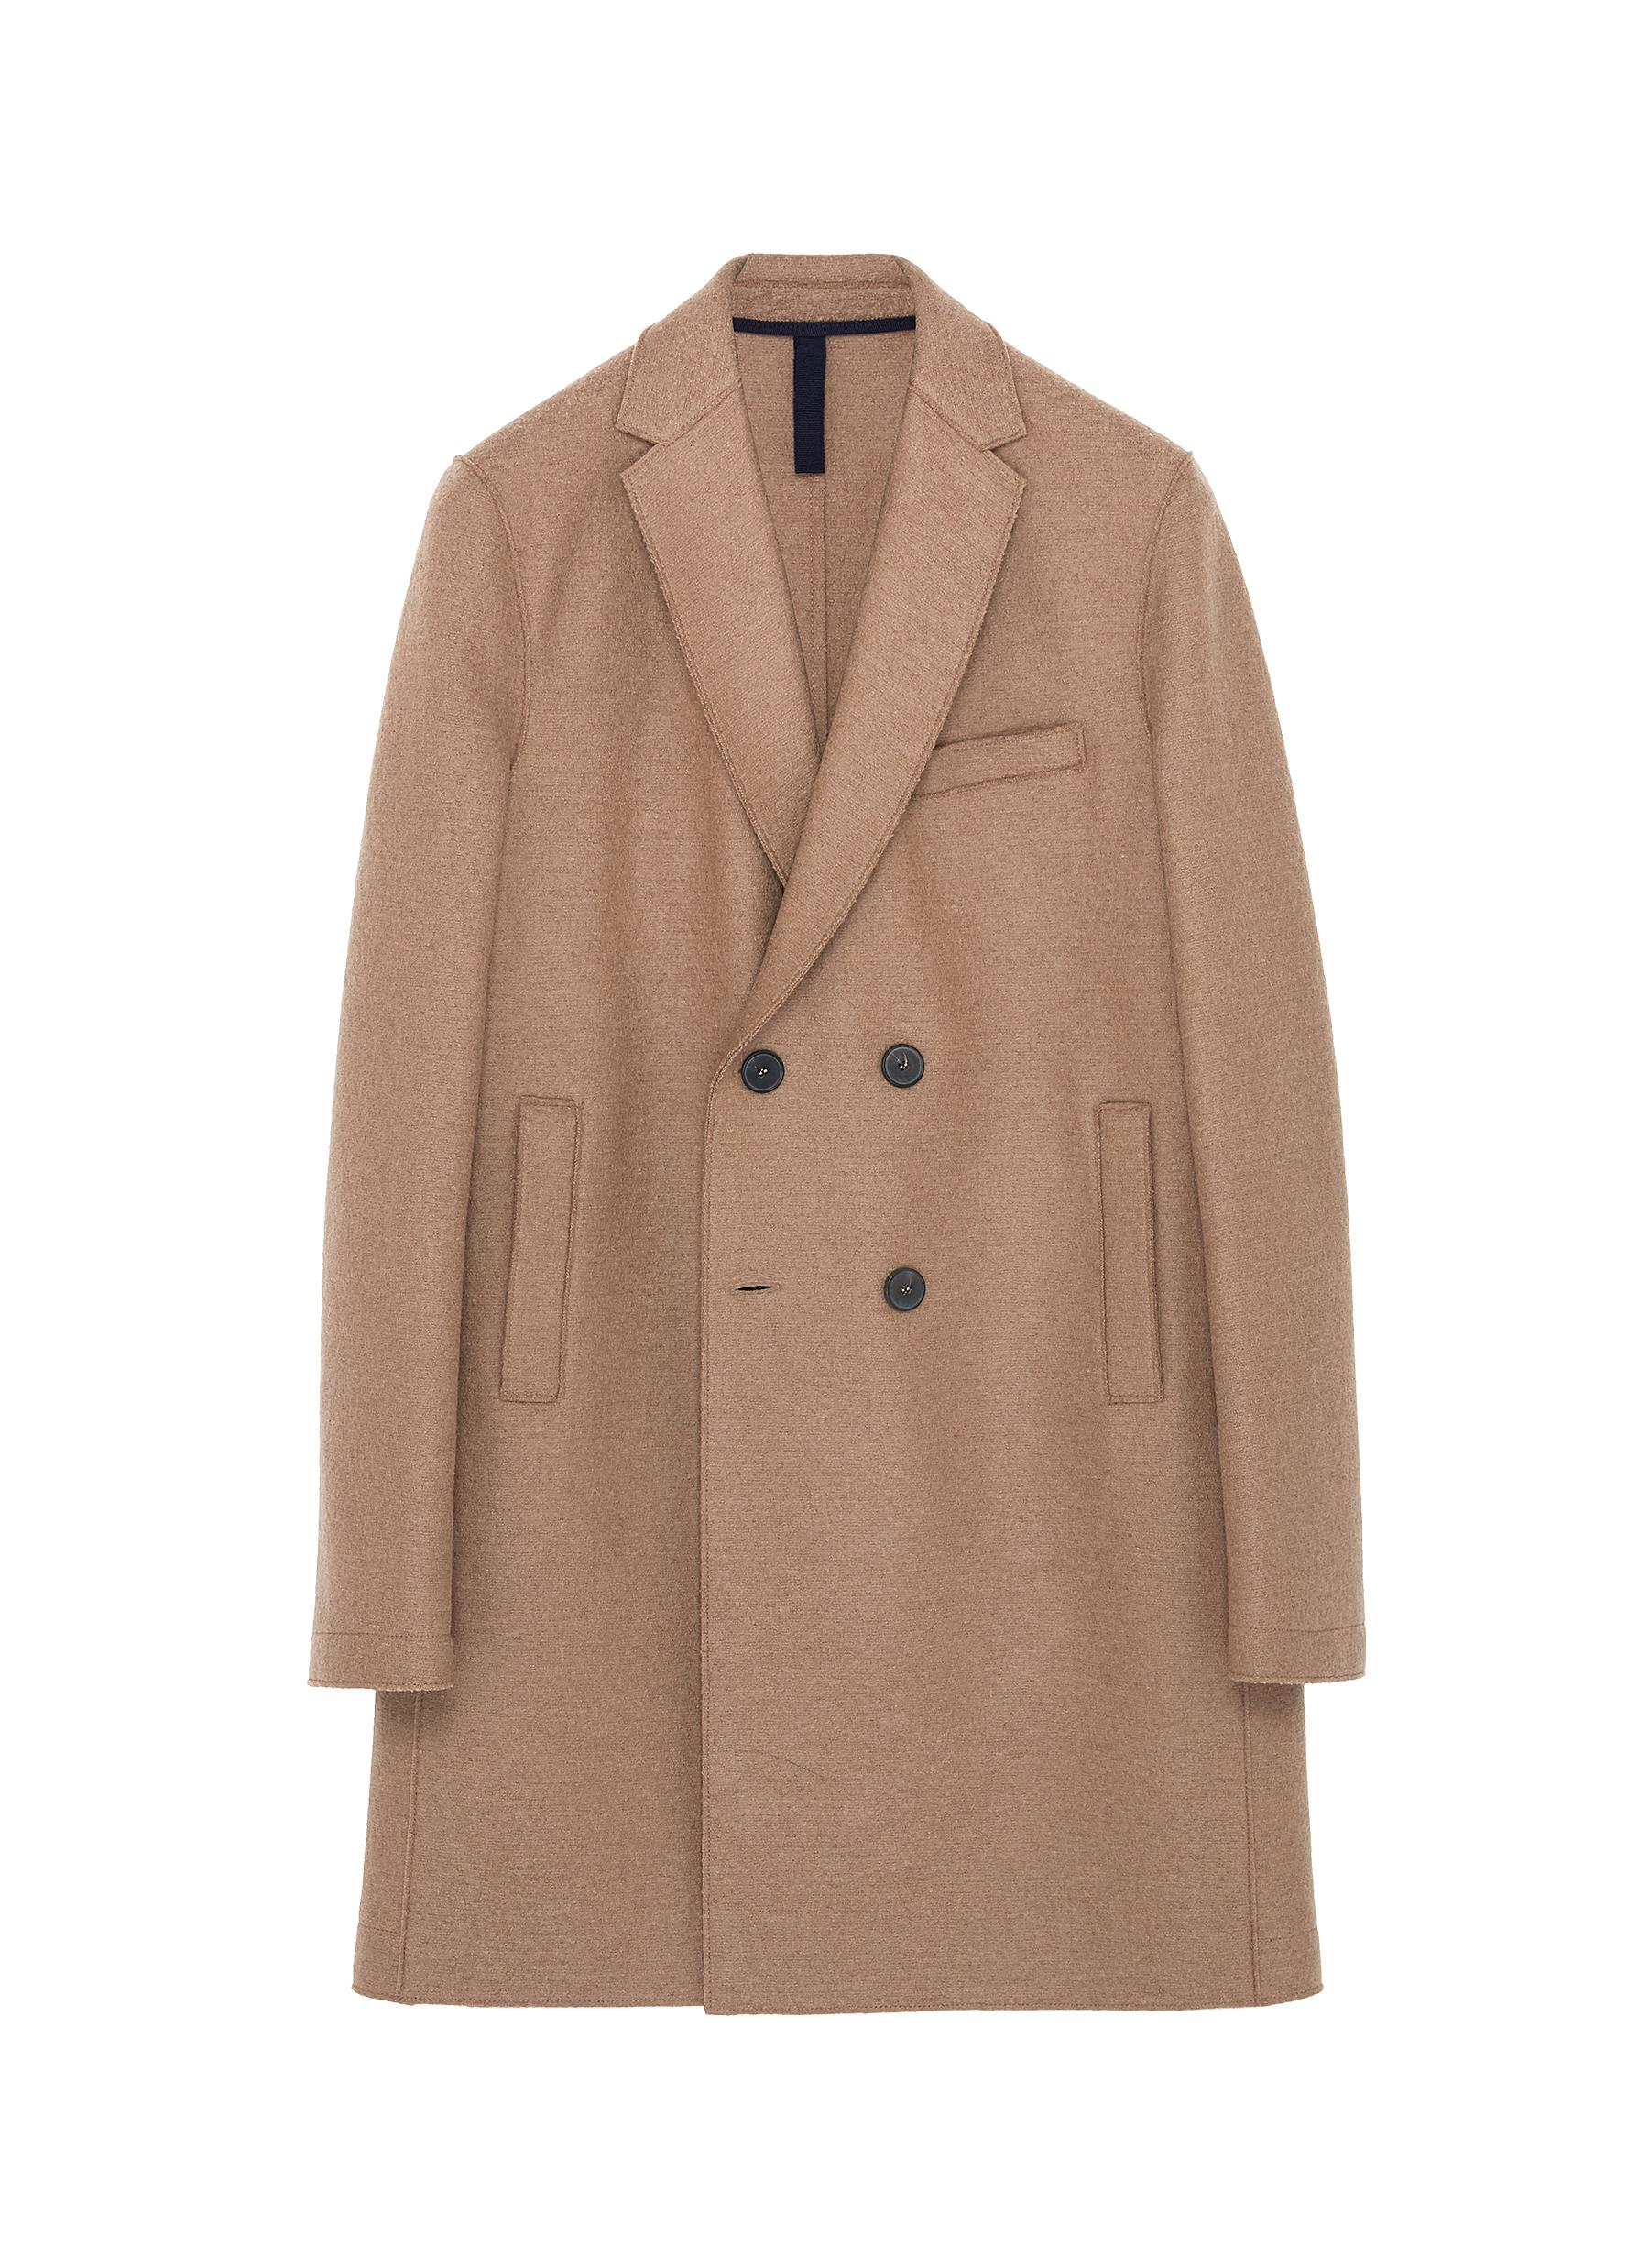 Harris Wharf London. Virgin wool melton double breasted coat 3ce9004567211